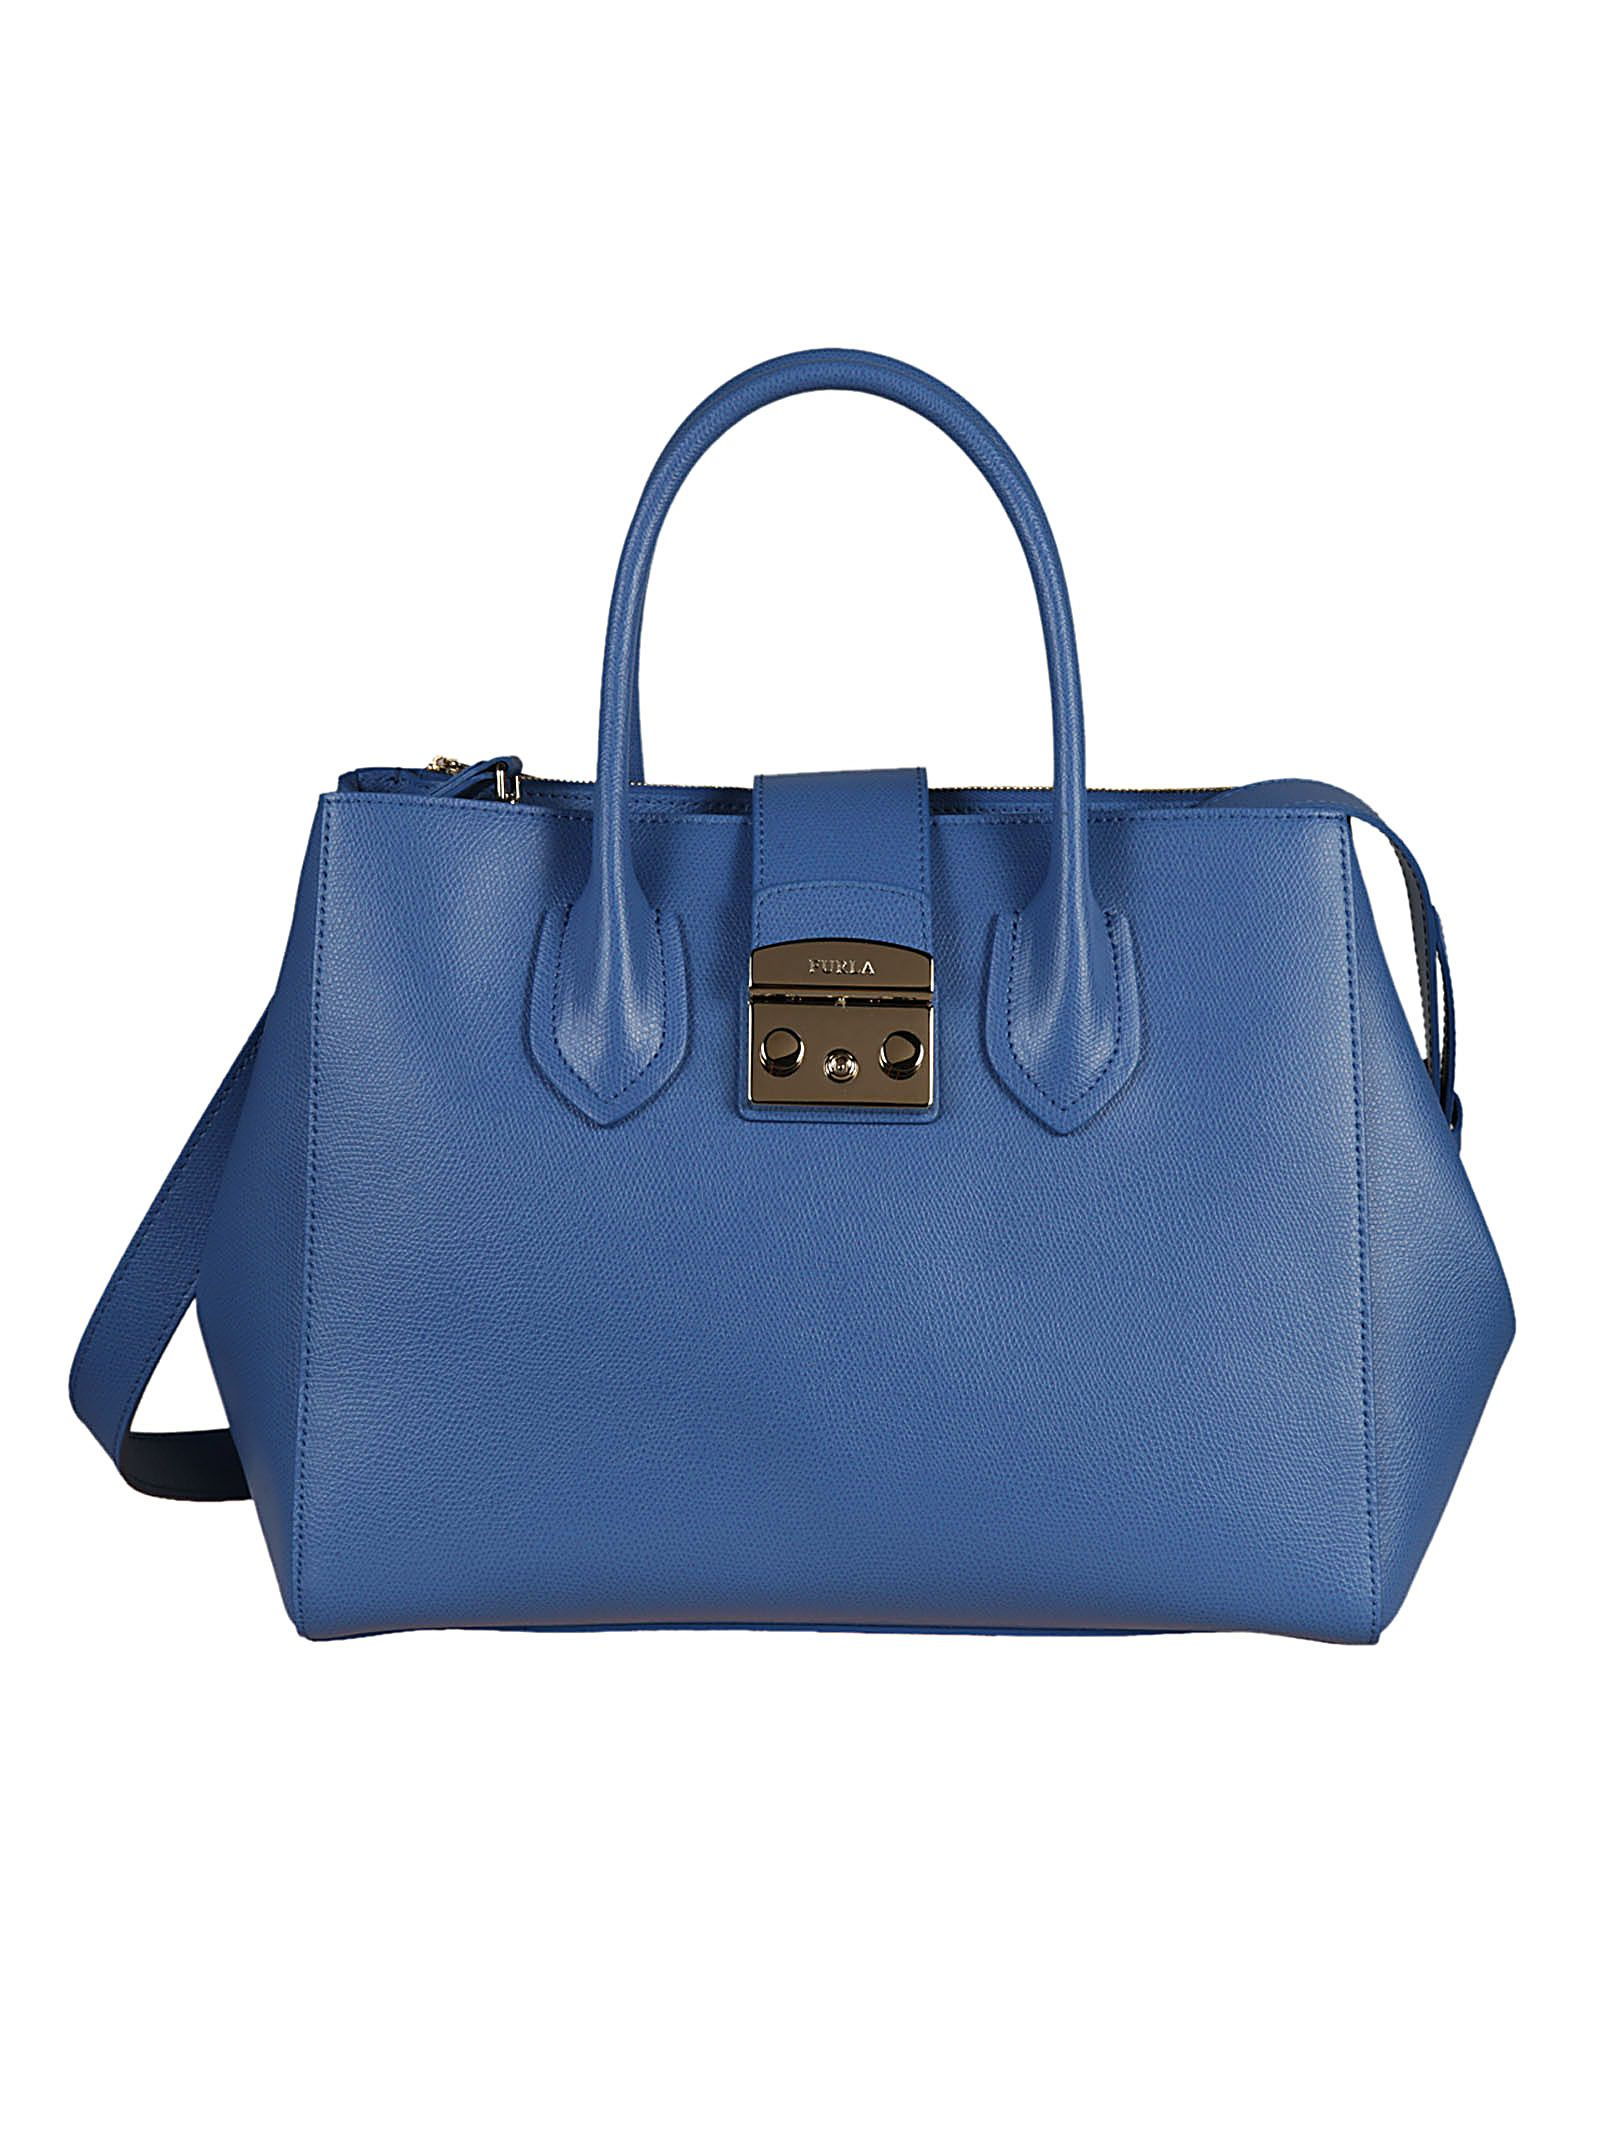 Shoulder Bag for Women On Sale, Metropolis, Sky, Leather, 2017, one size Furla